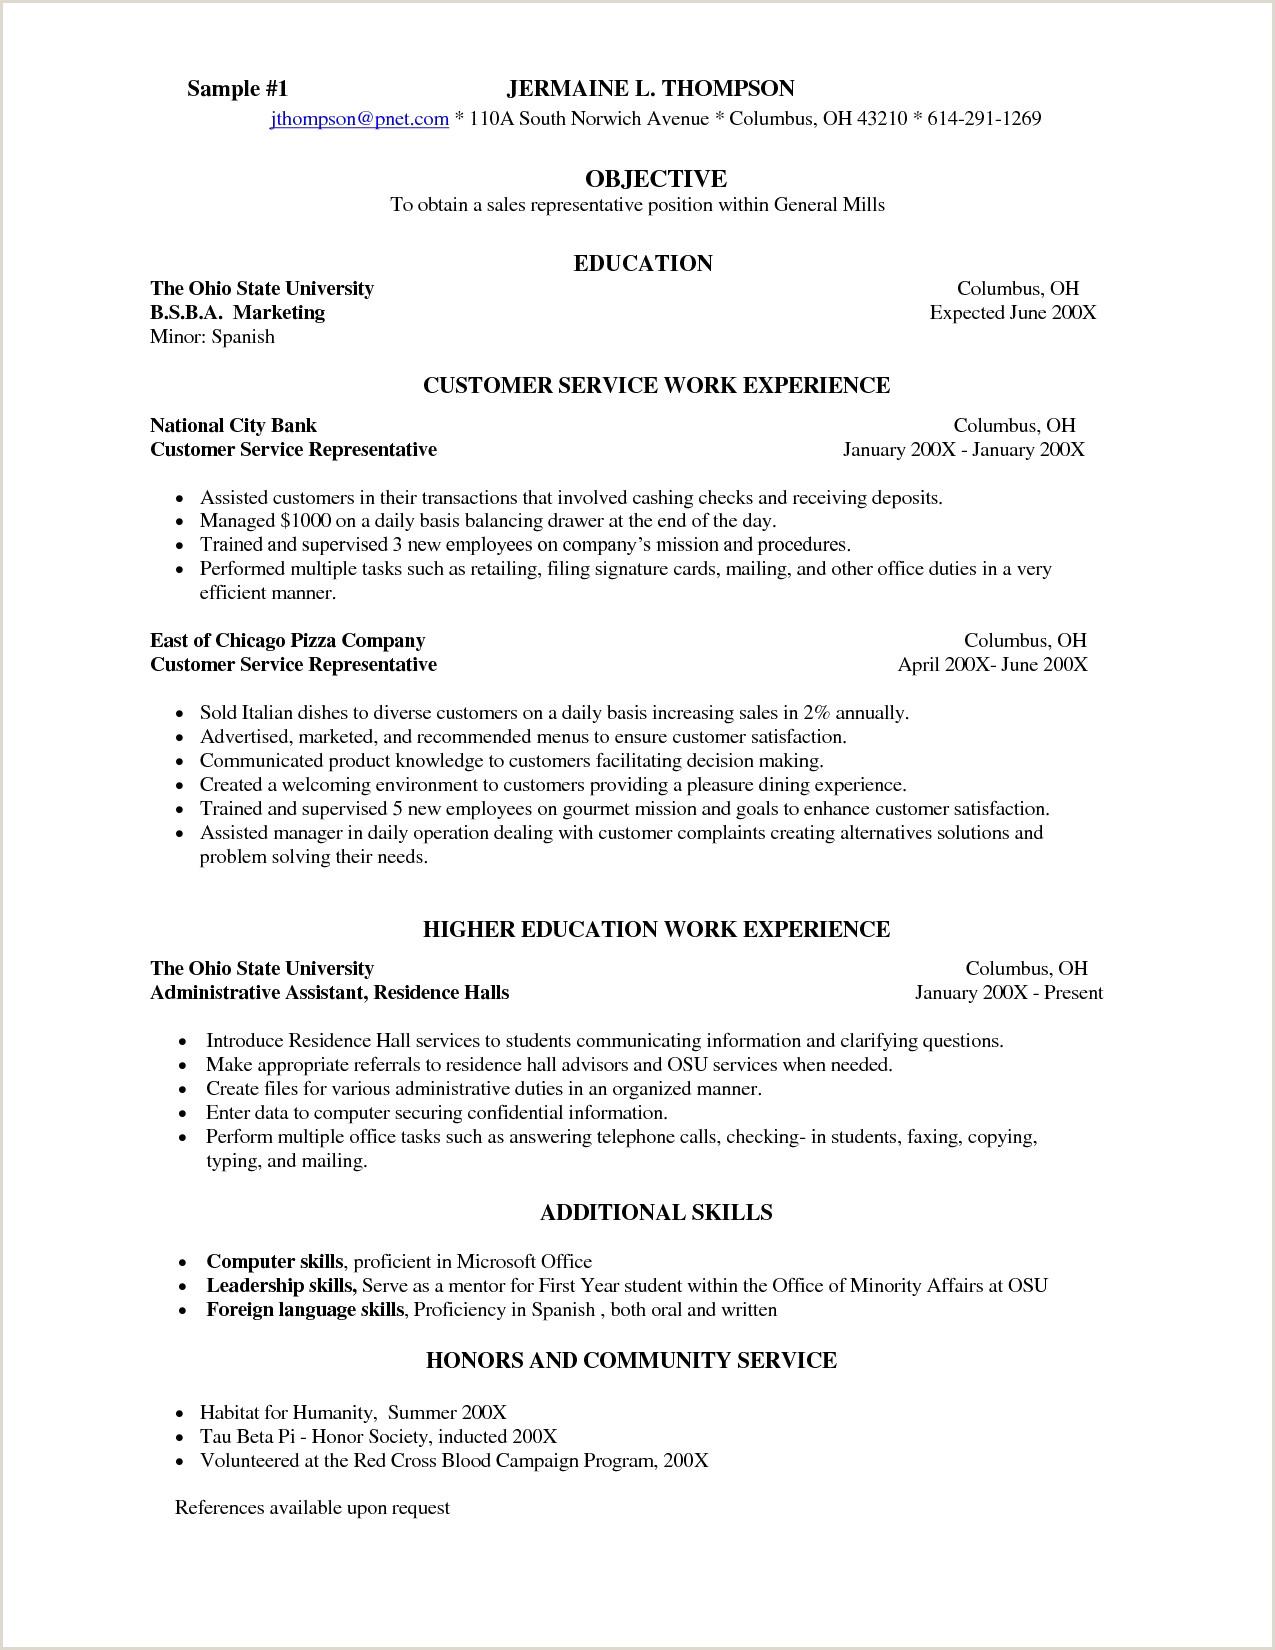 Waitress Duties Resume Waitress Job Description Resume Luxury Waitress Duties